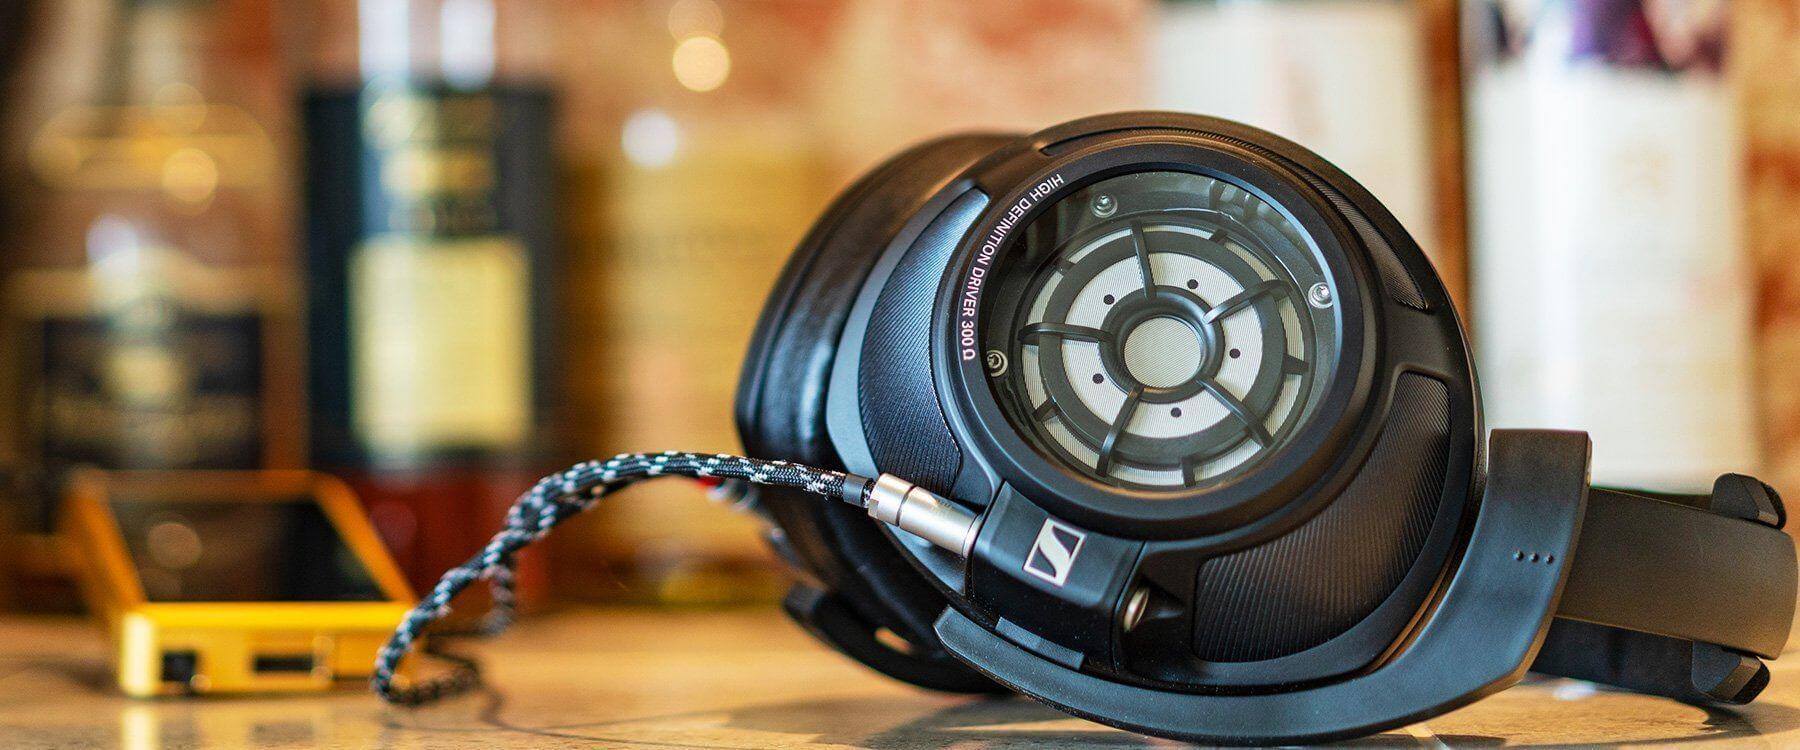 Sennheiser HD820 Closed-Back Headphone - Review